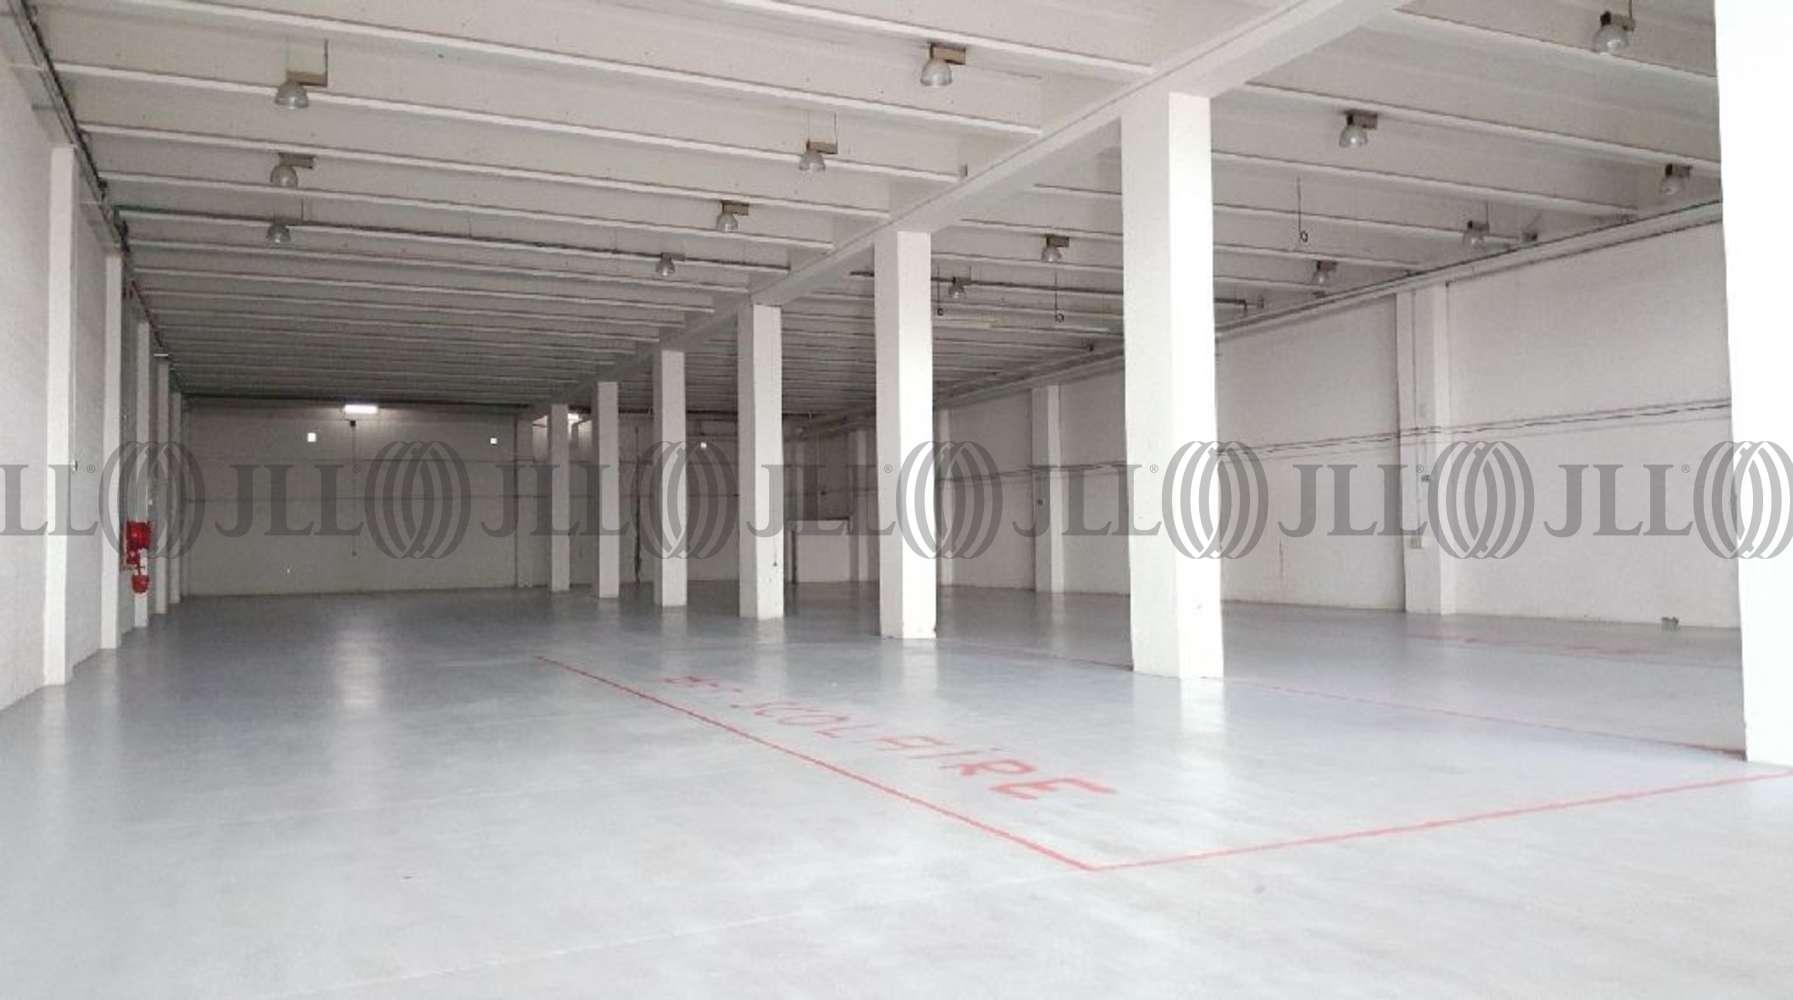 Activités/entrepôt Antony, 92160 - 34 AVENUE LEON JOUHAUX - 9458561